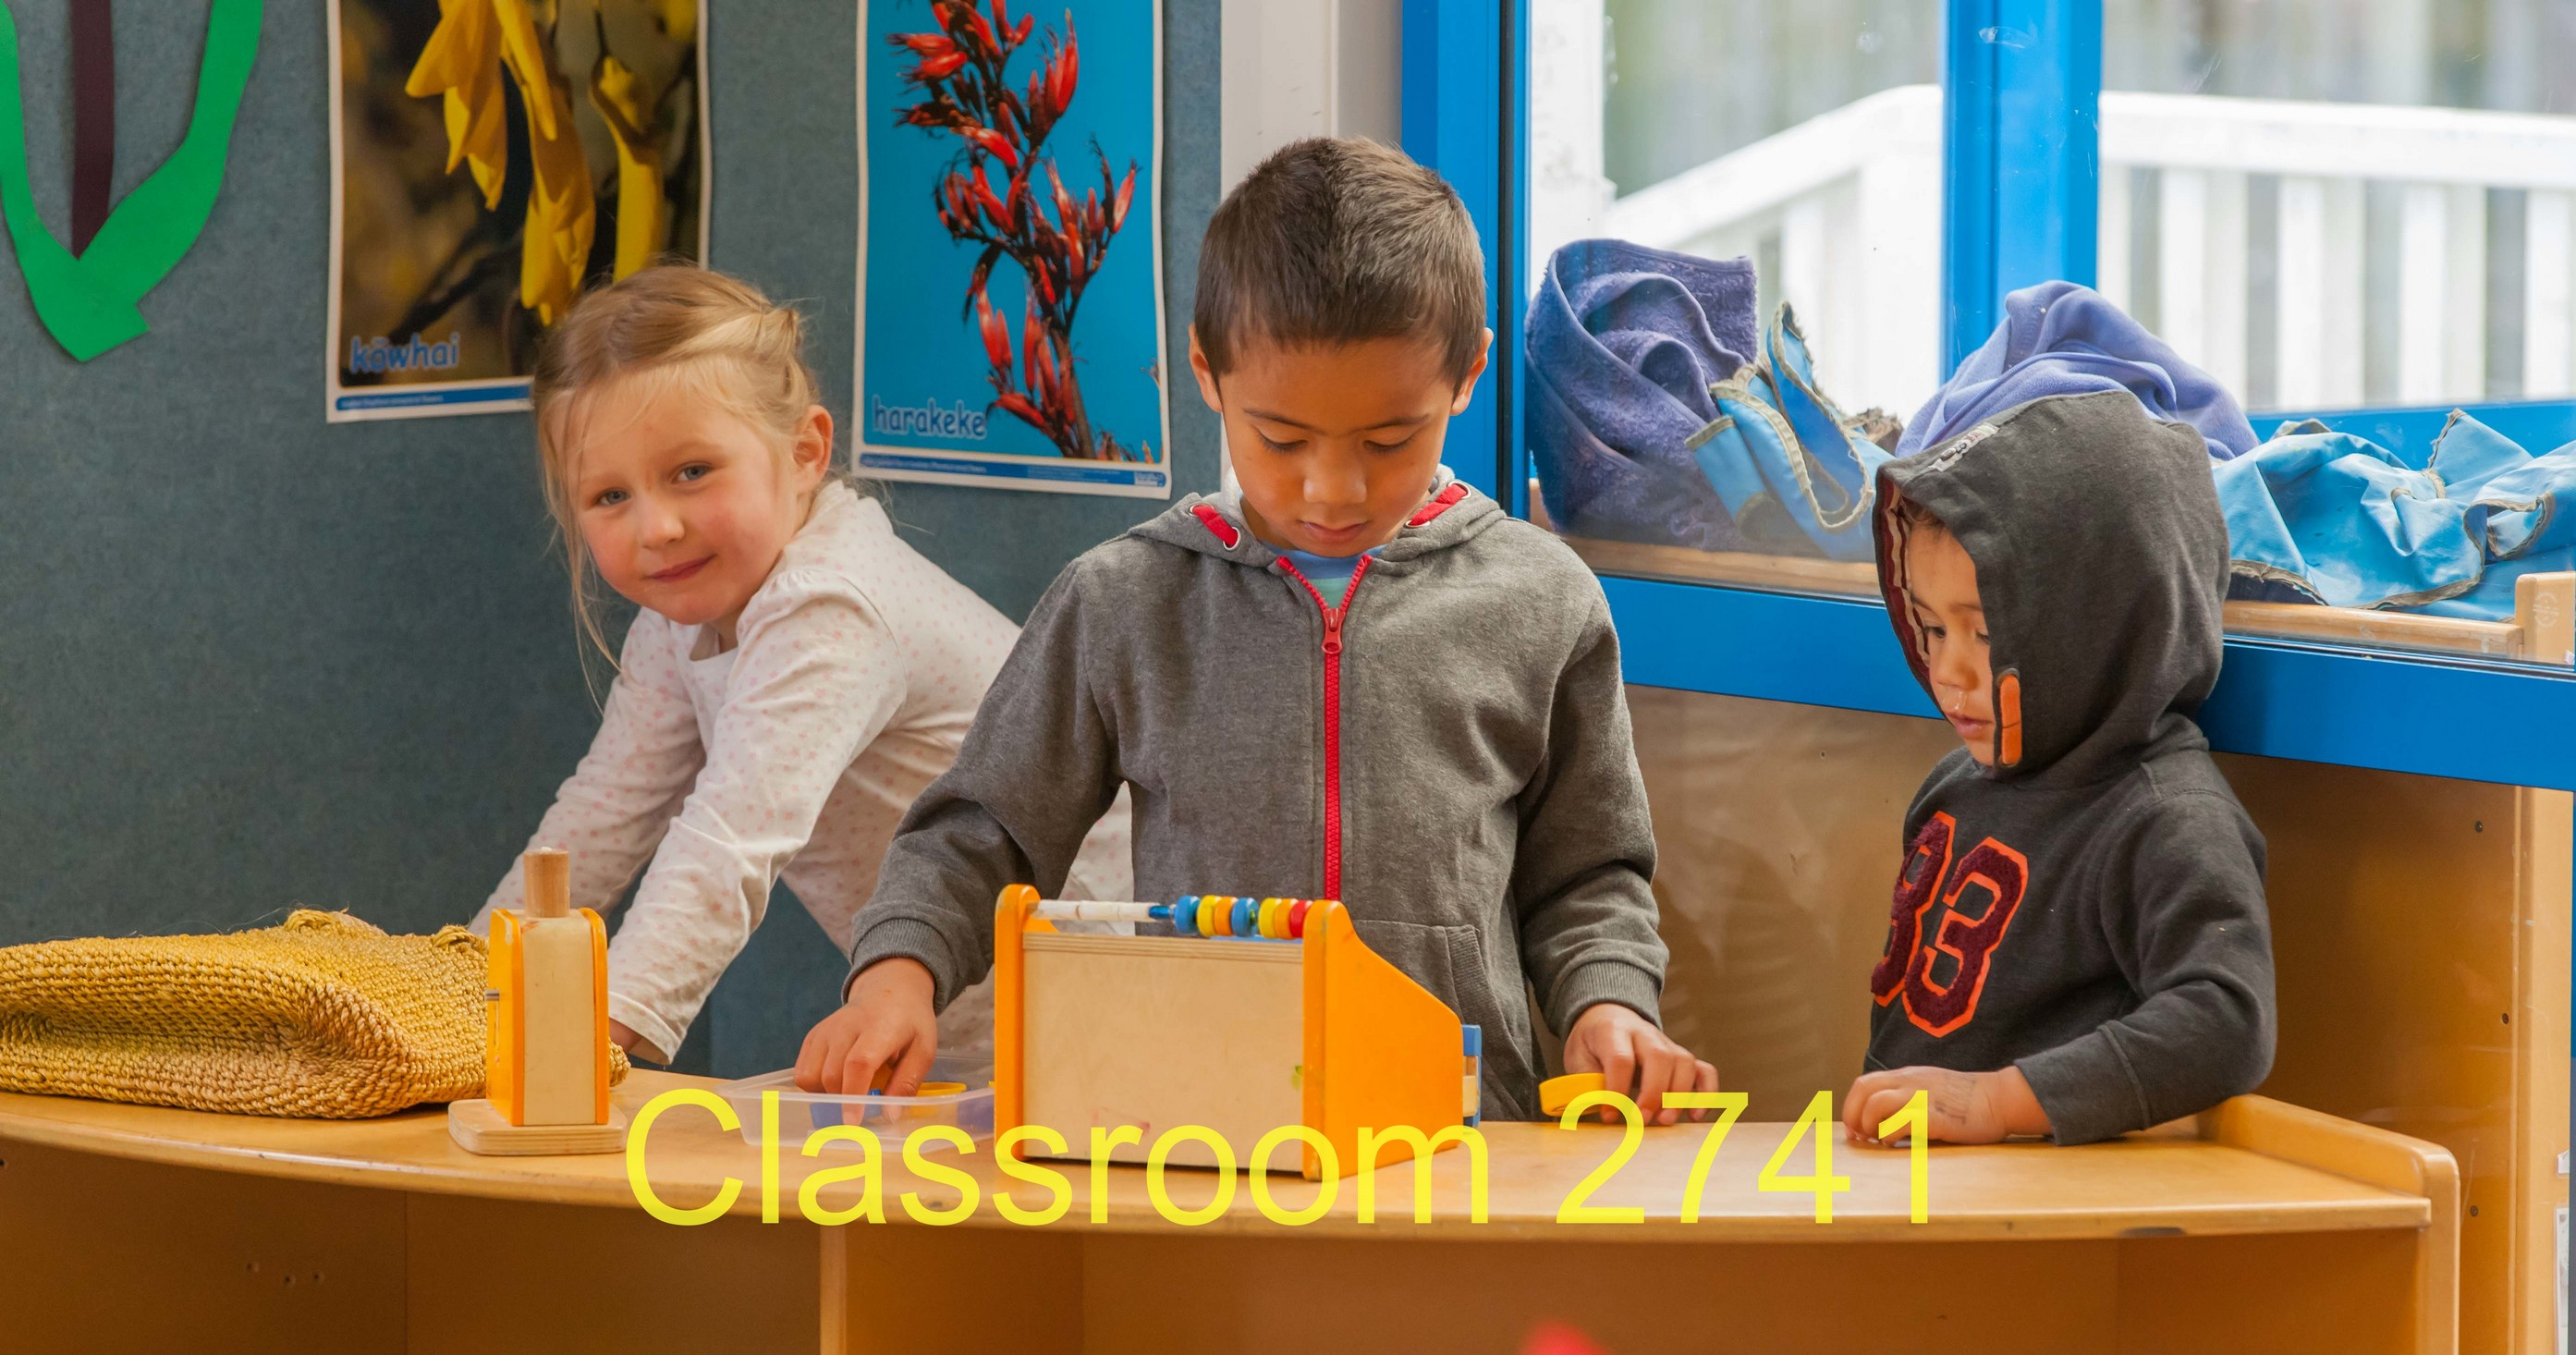 Classroom 2741